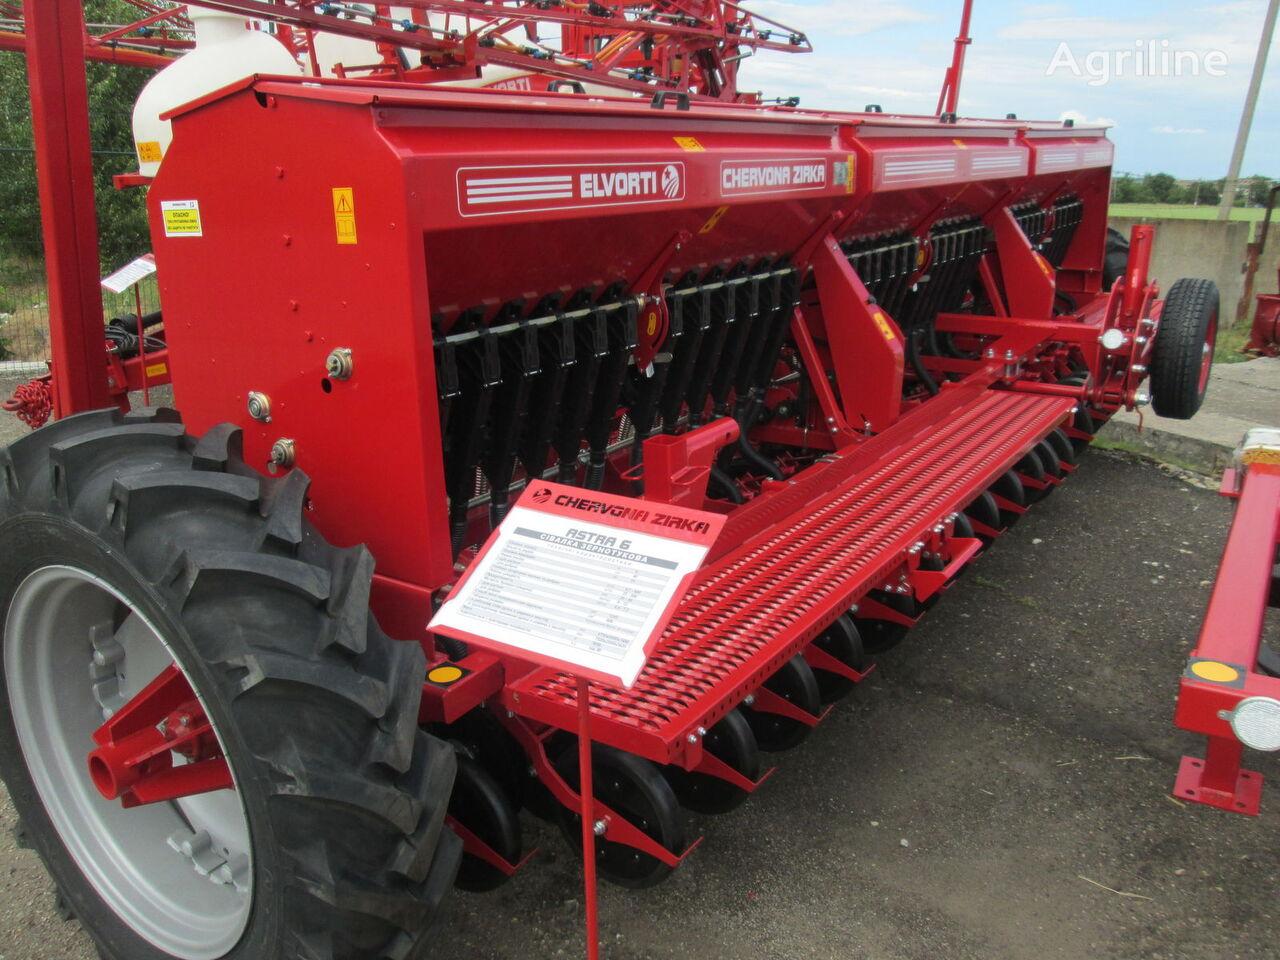 ELVORTI (CHERVONA ZIRKA) SZ 3,6 / 4 / 5,4 / 6 (Astra Standart / Premium) sembradora mecánica nueva